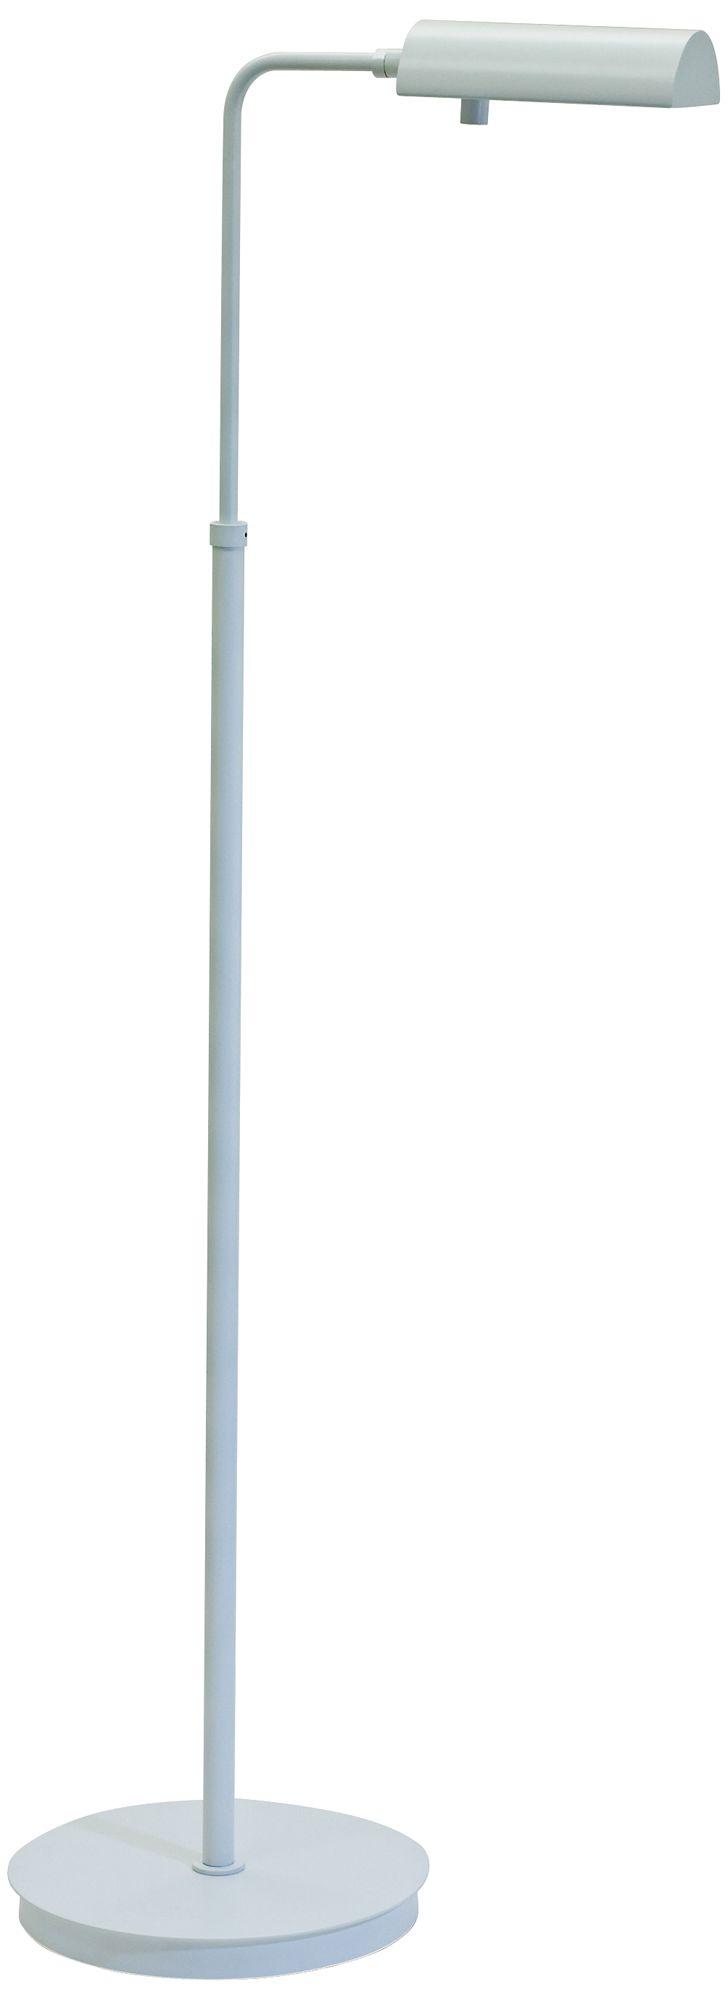 House Of Troy Generation White Pharmacy Floor Lamp